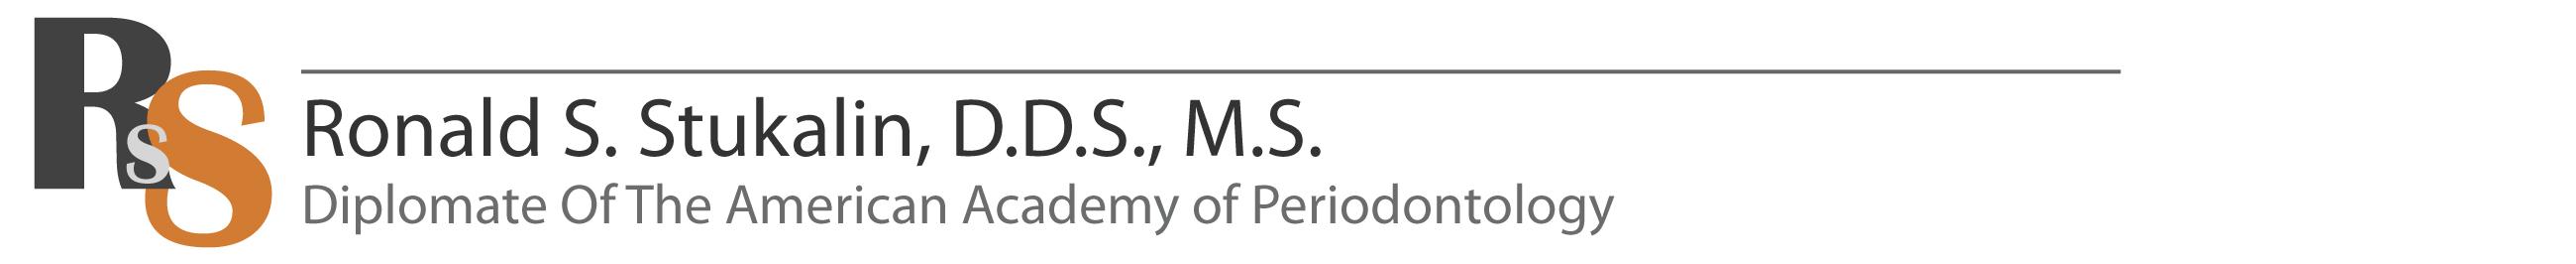 Ronald S. Stukalin Periodontist Retina Logo